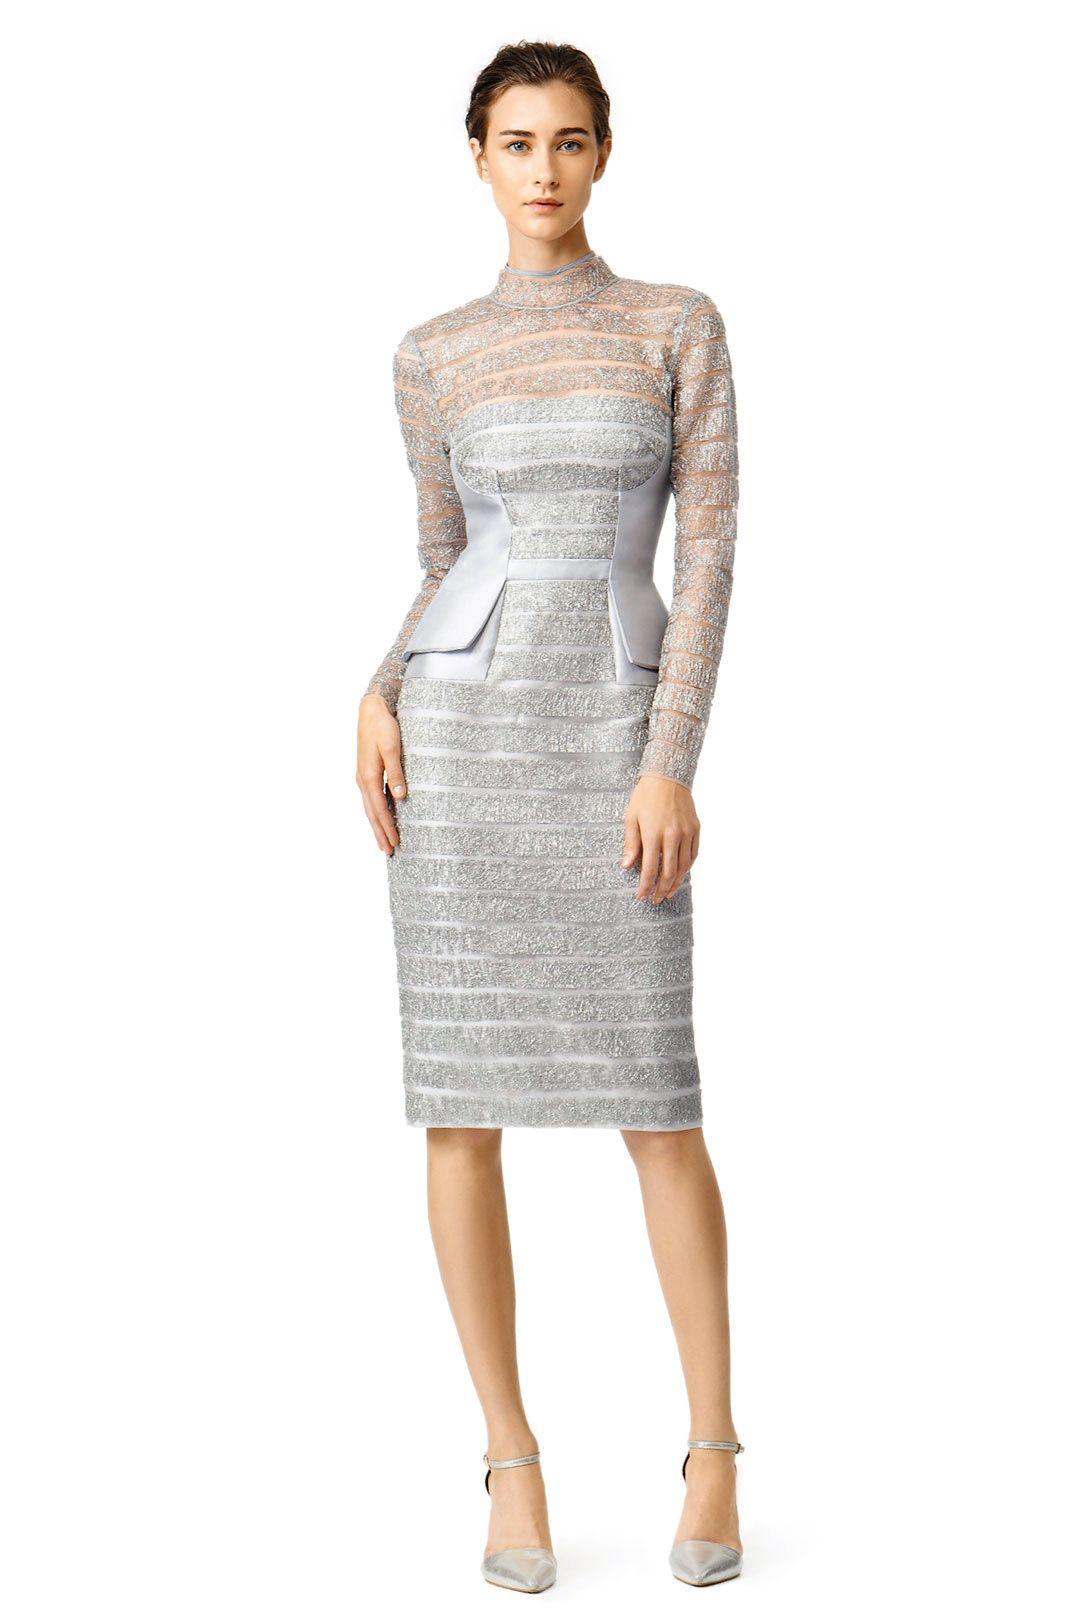 Bibhu mohapatra lines of lace dress b dresses pinterest bibhu